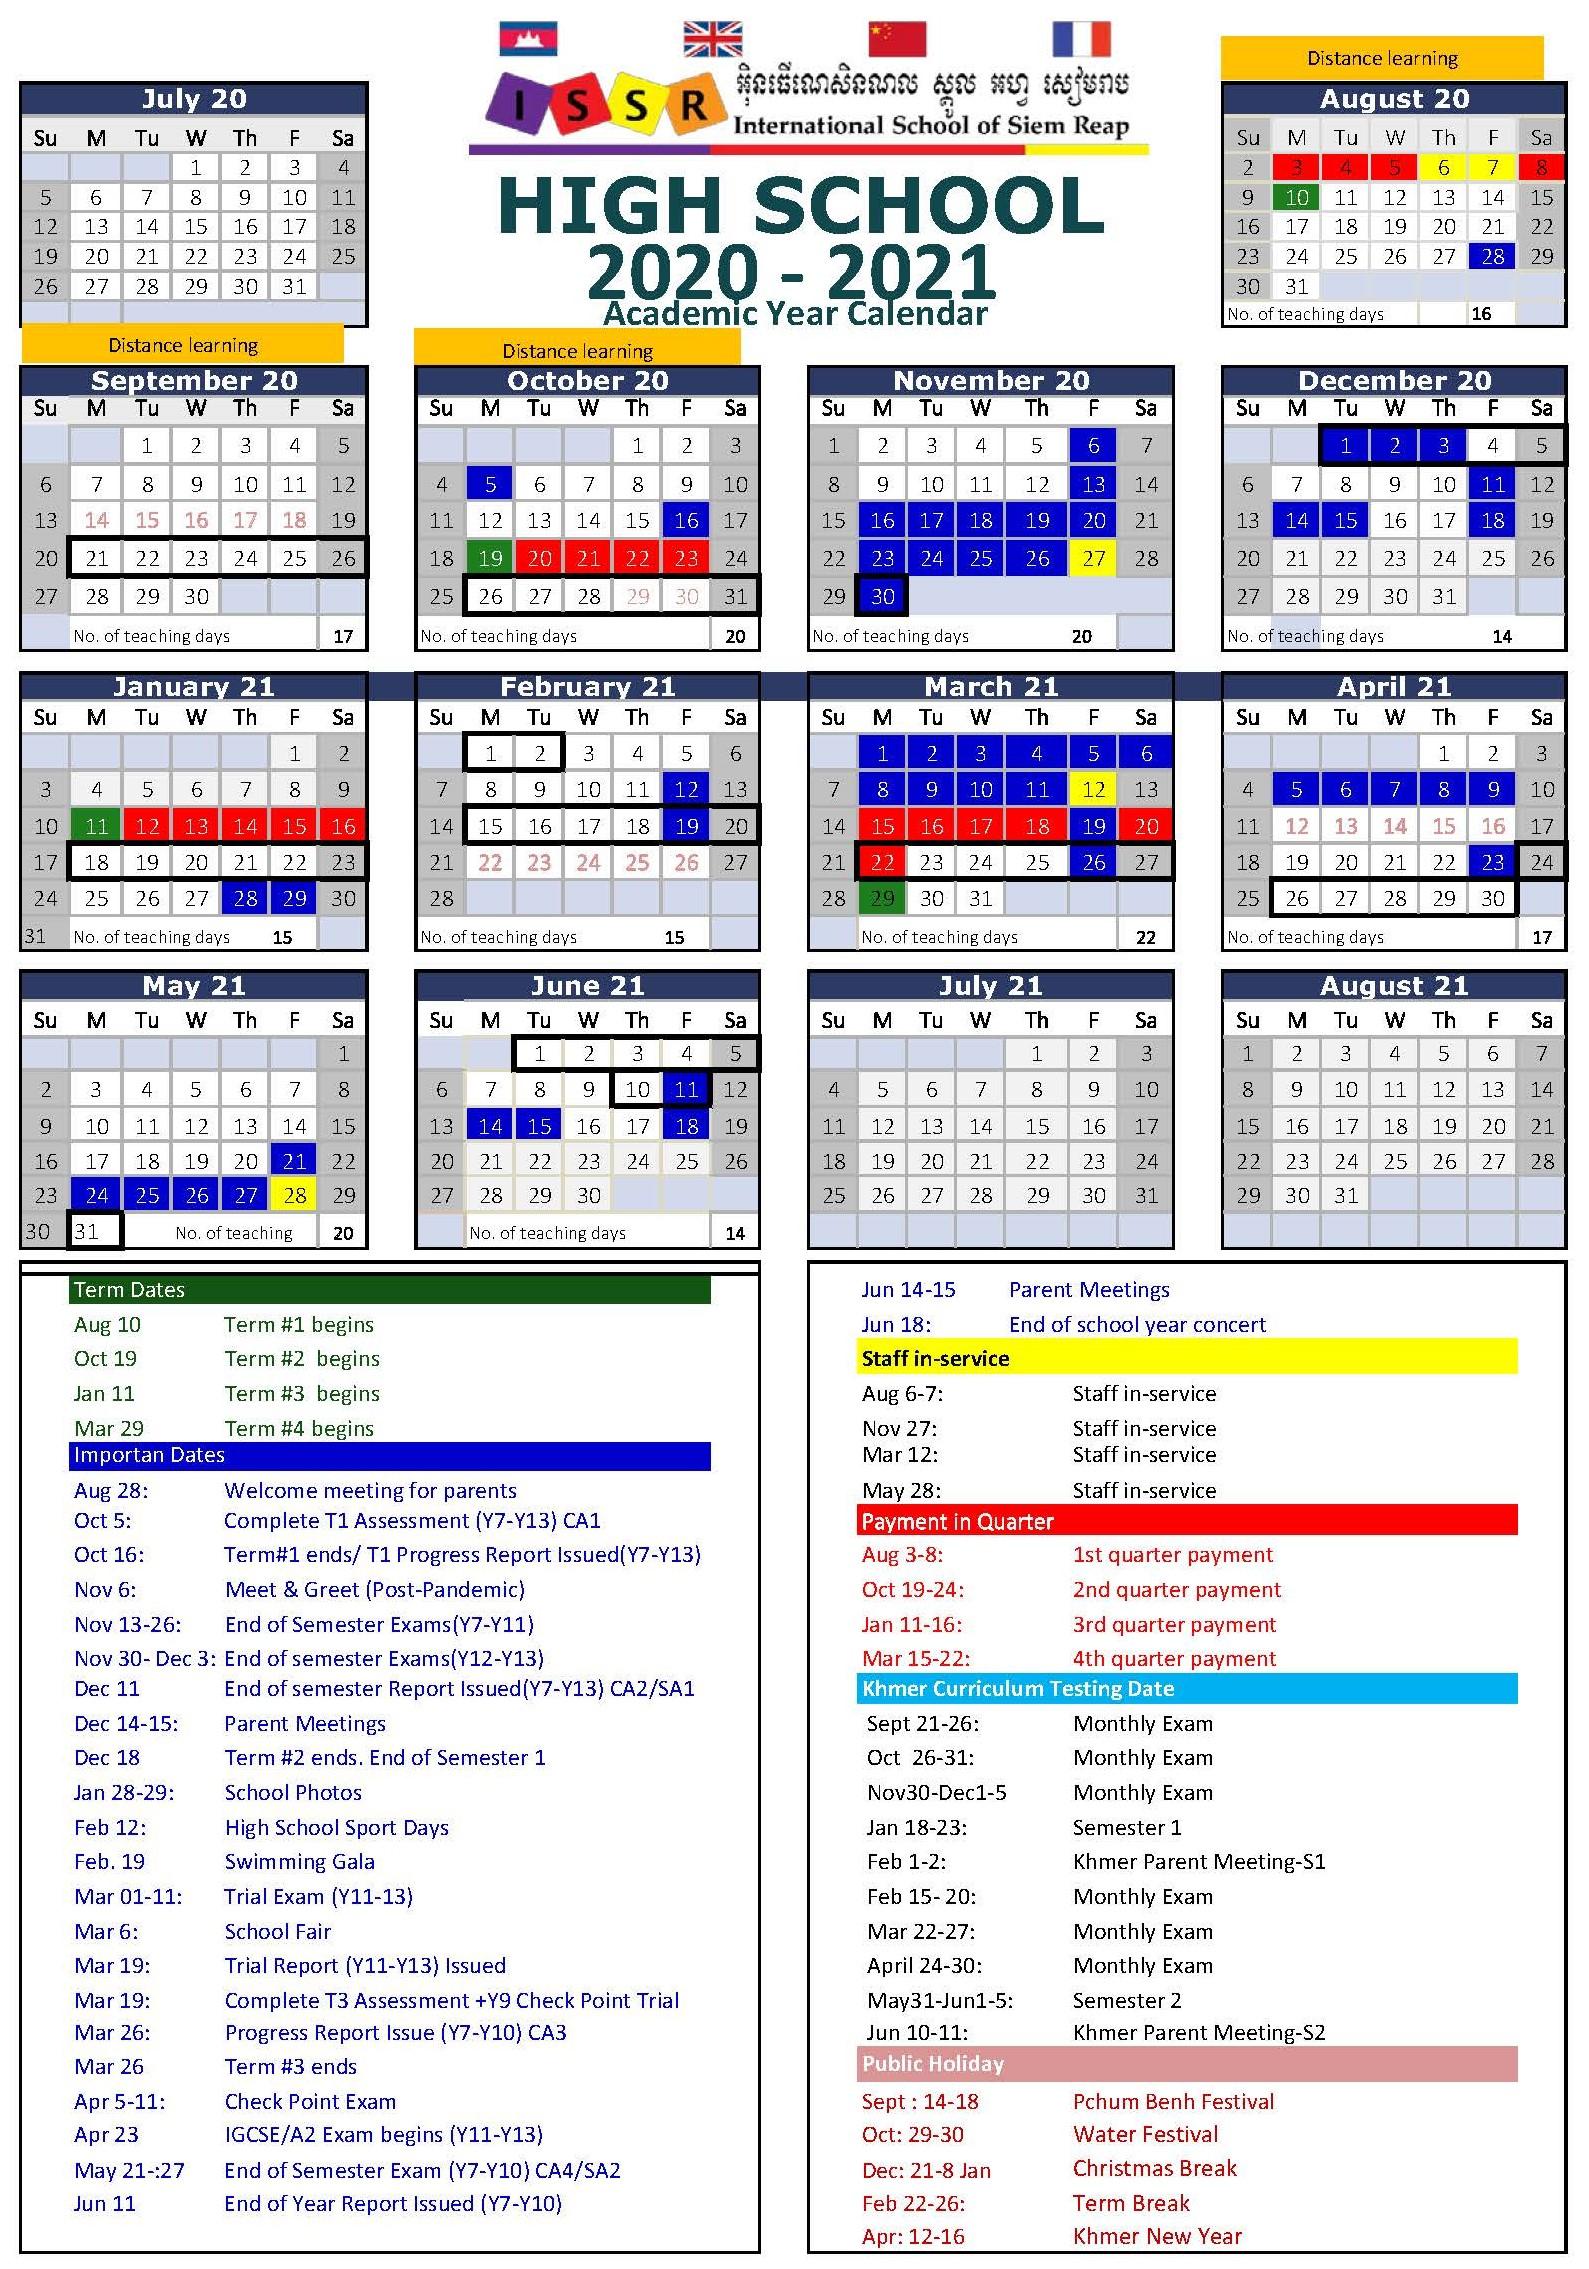 High School Calendar 2020-2021